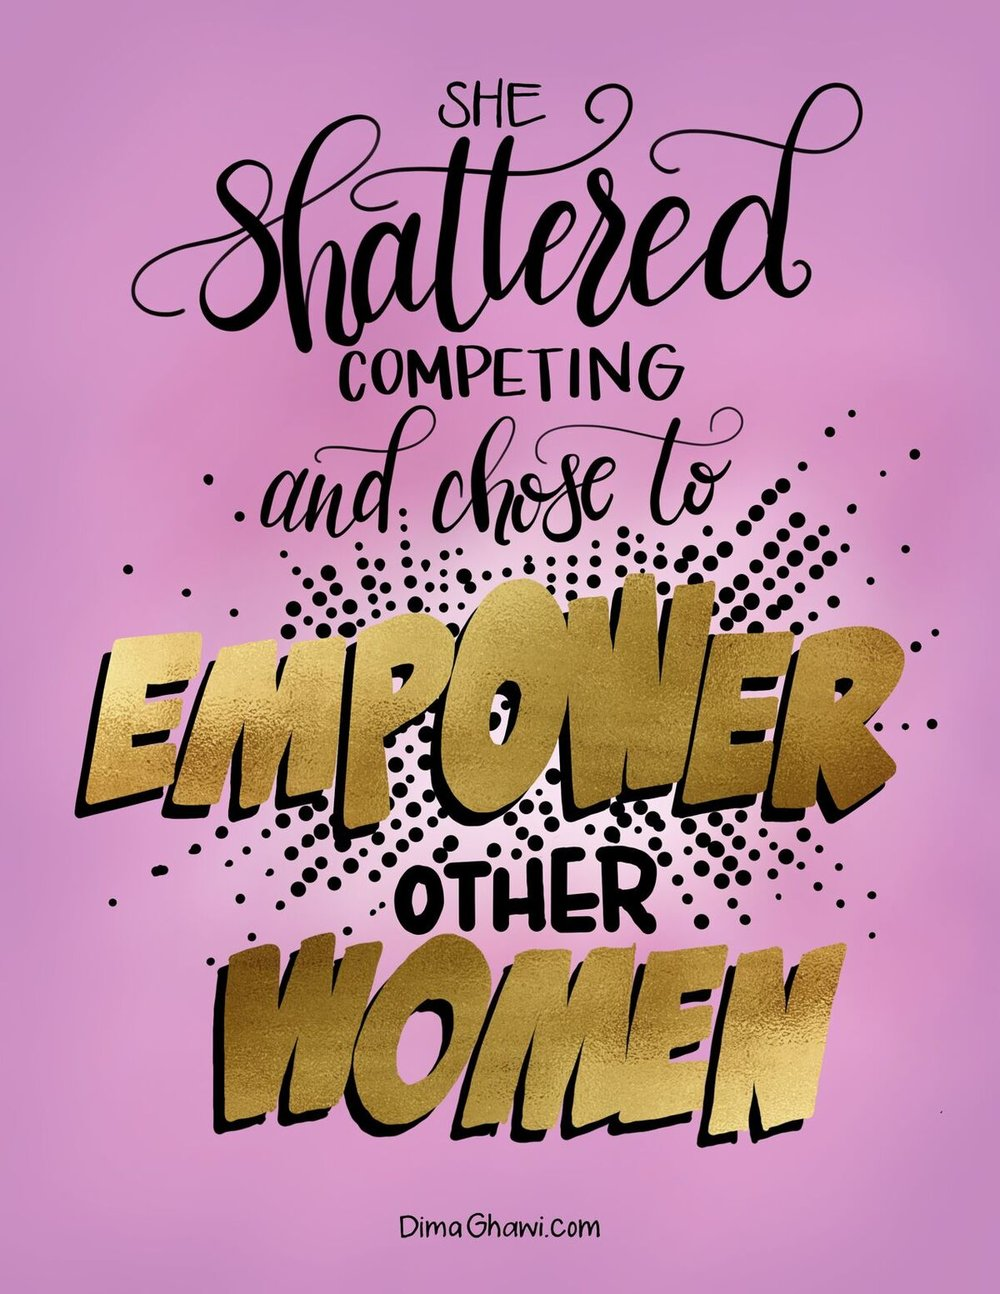 Empower+Women_Dima+Ghawi.jpeg